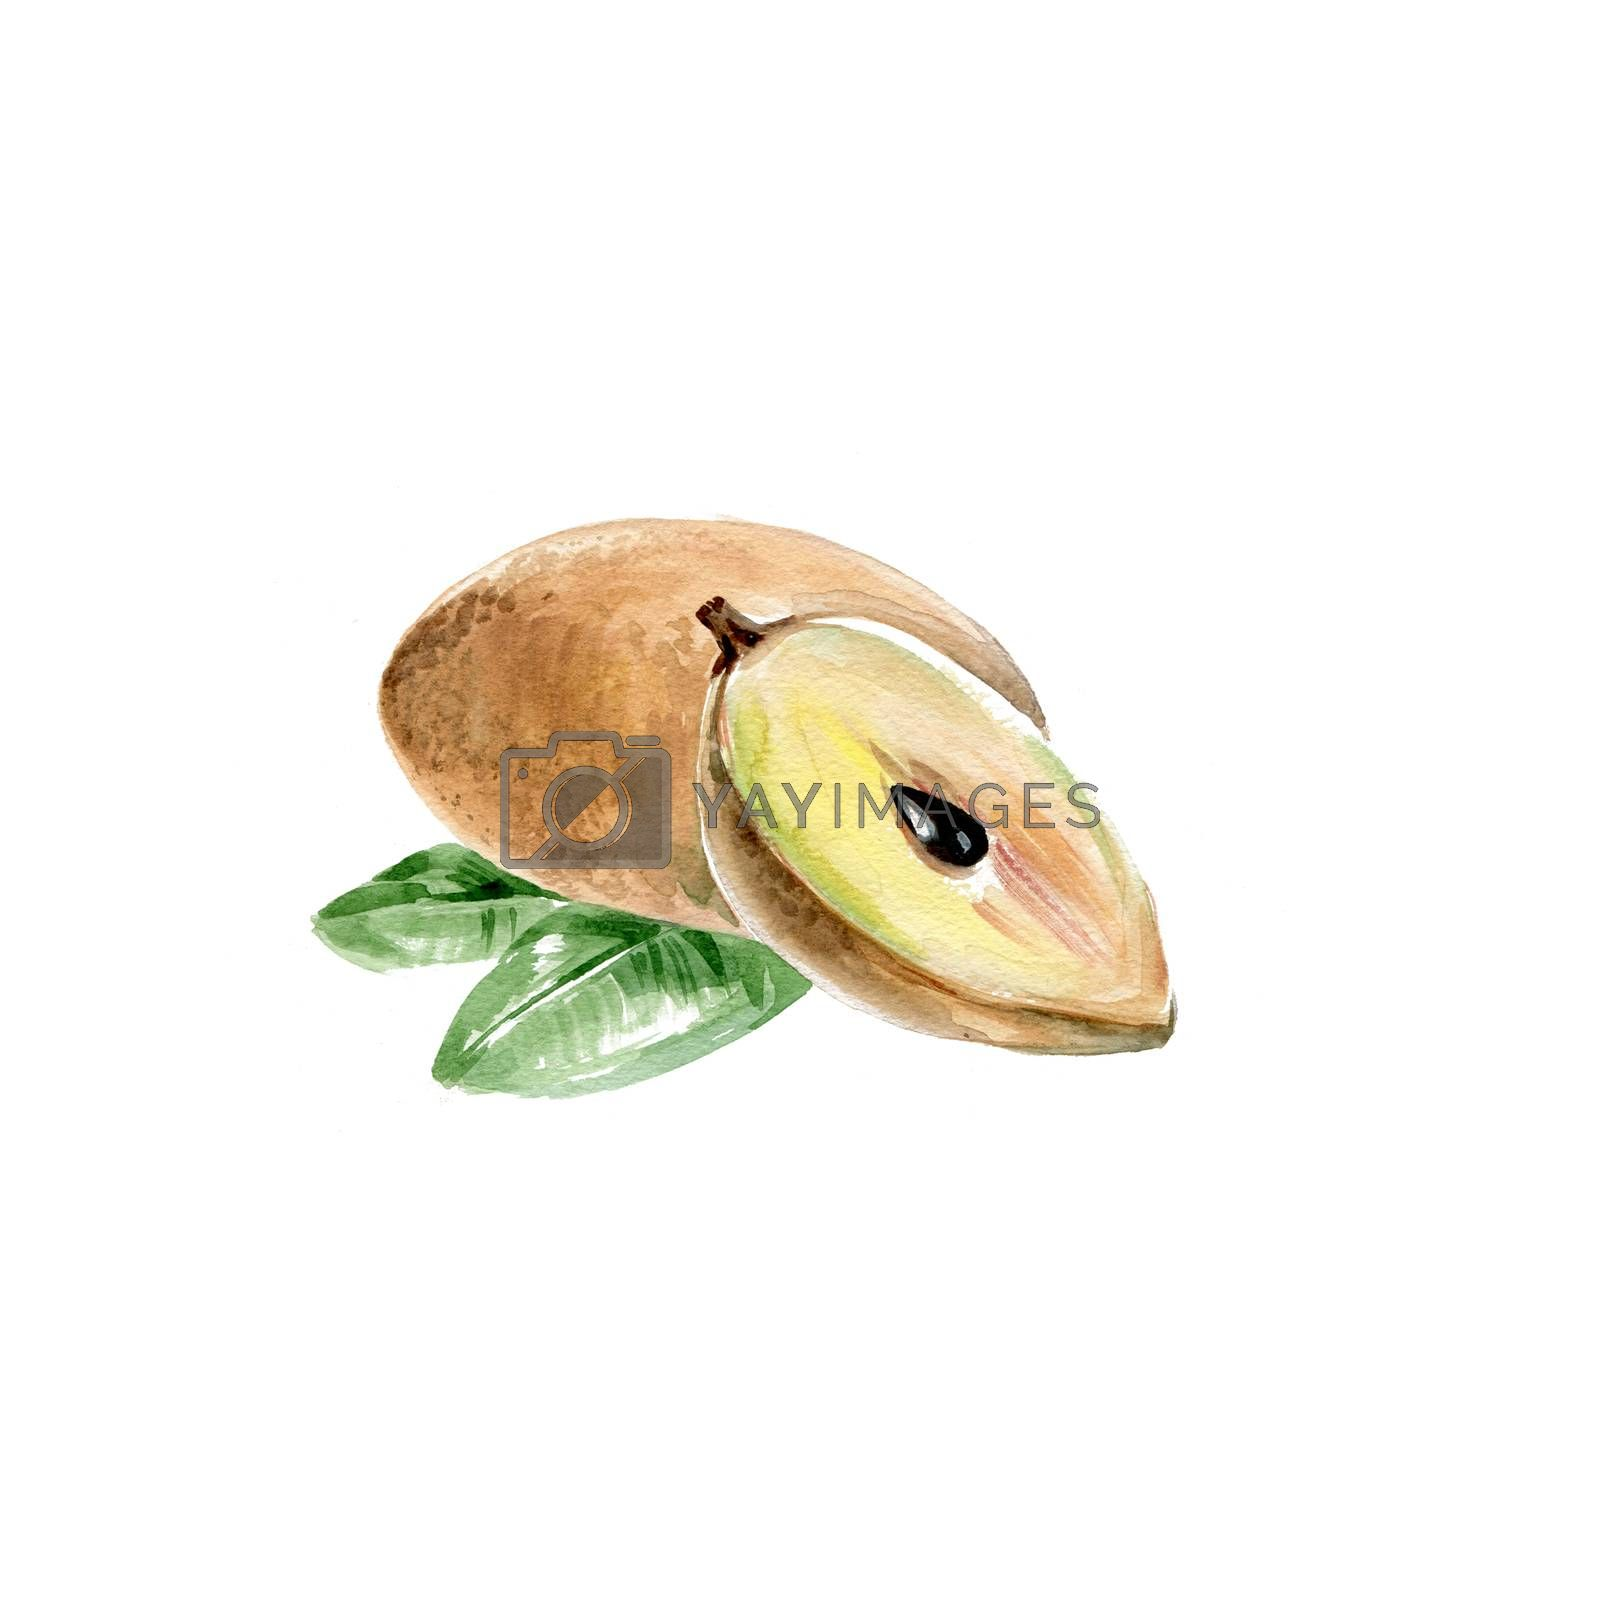 Watercolor Sapodilla. Hand Drawn Illustration Organic Food Vegetarian Ingredient